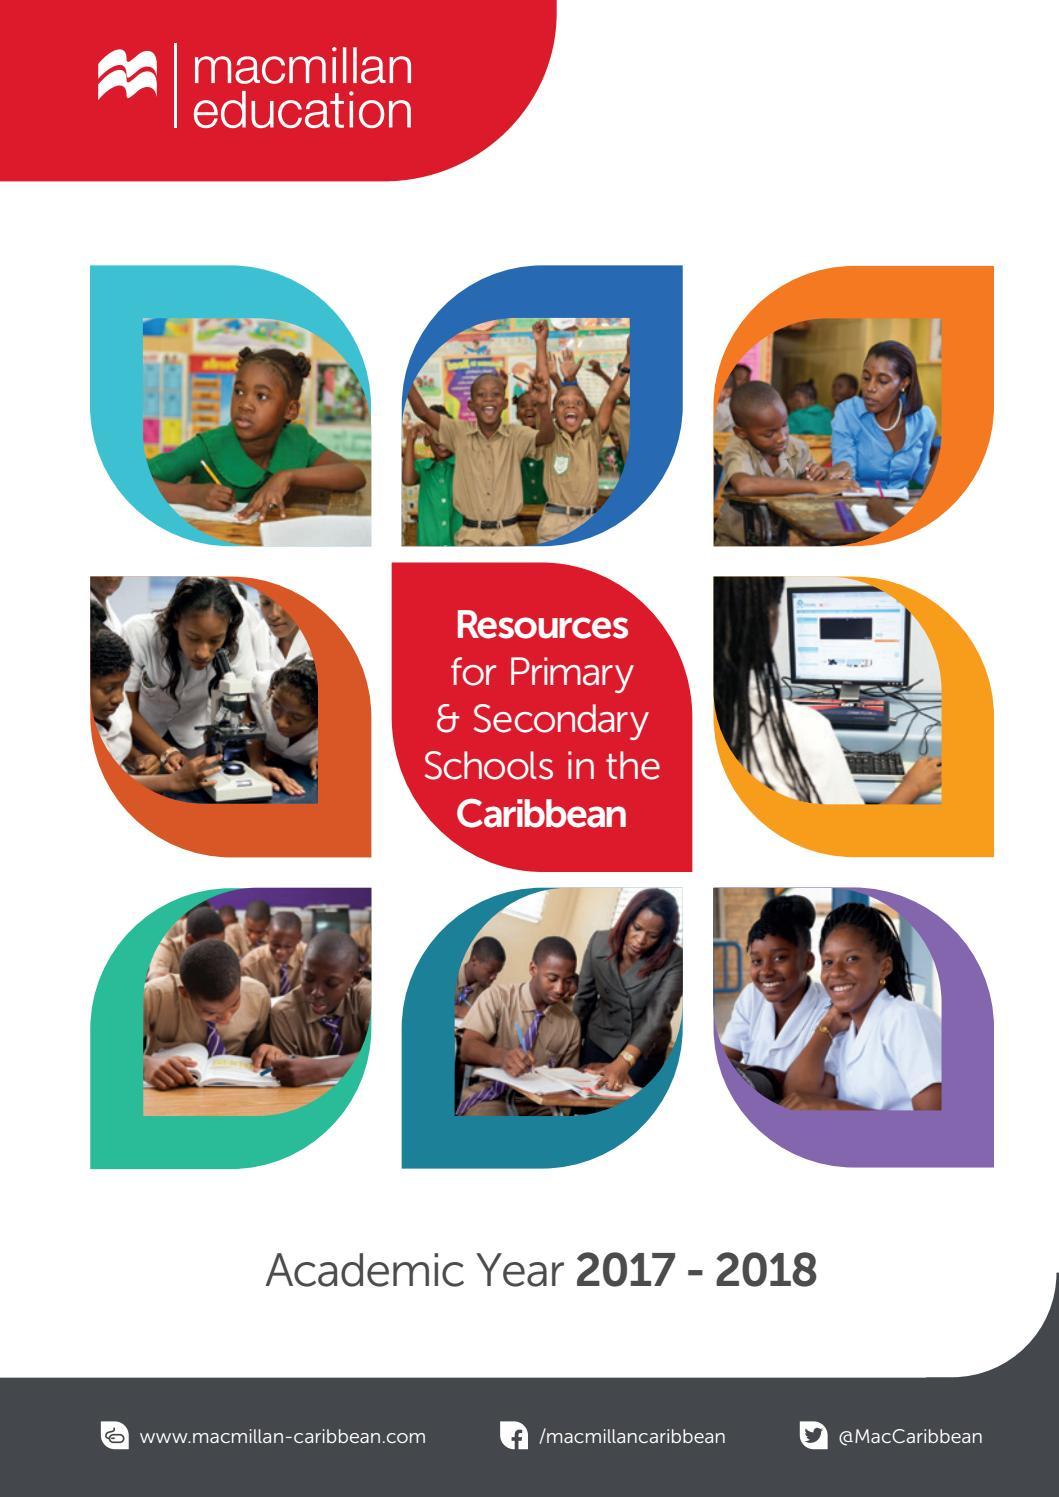 Macmillan education caribbean catalogue 2017 2018 by macmillan macmillan education caribbean catalogue 2017 2018 by macmillan caribbean issuu fandeluxe Image collections